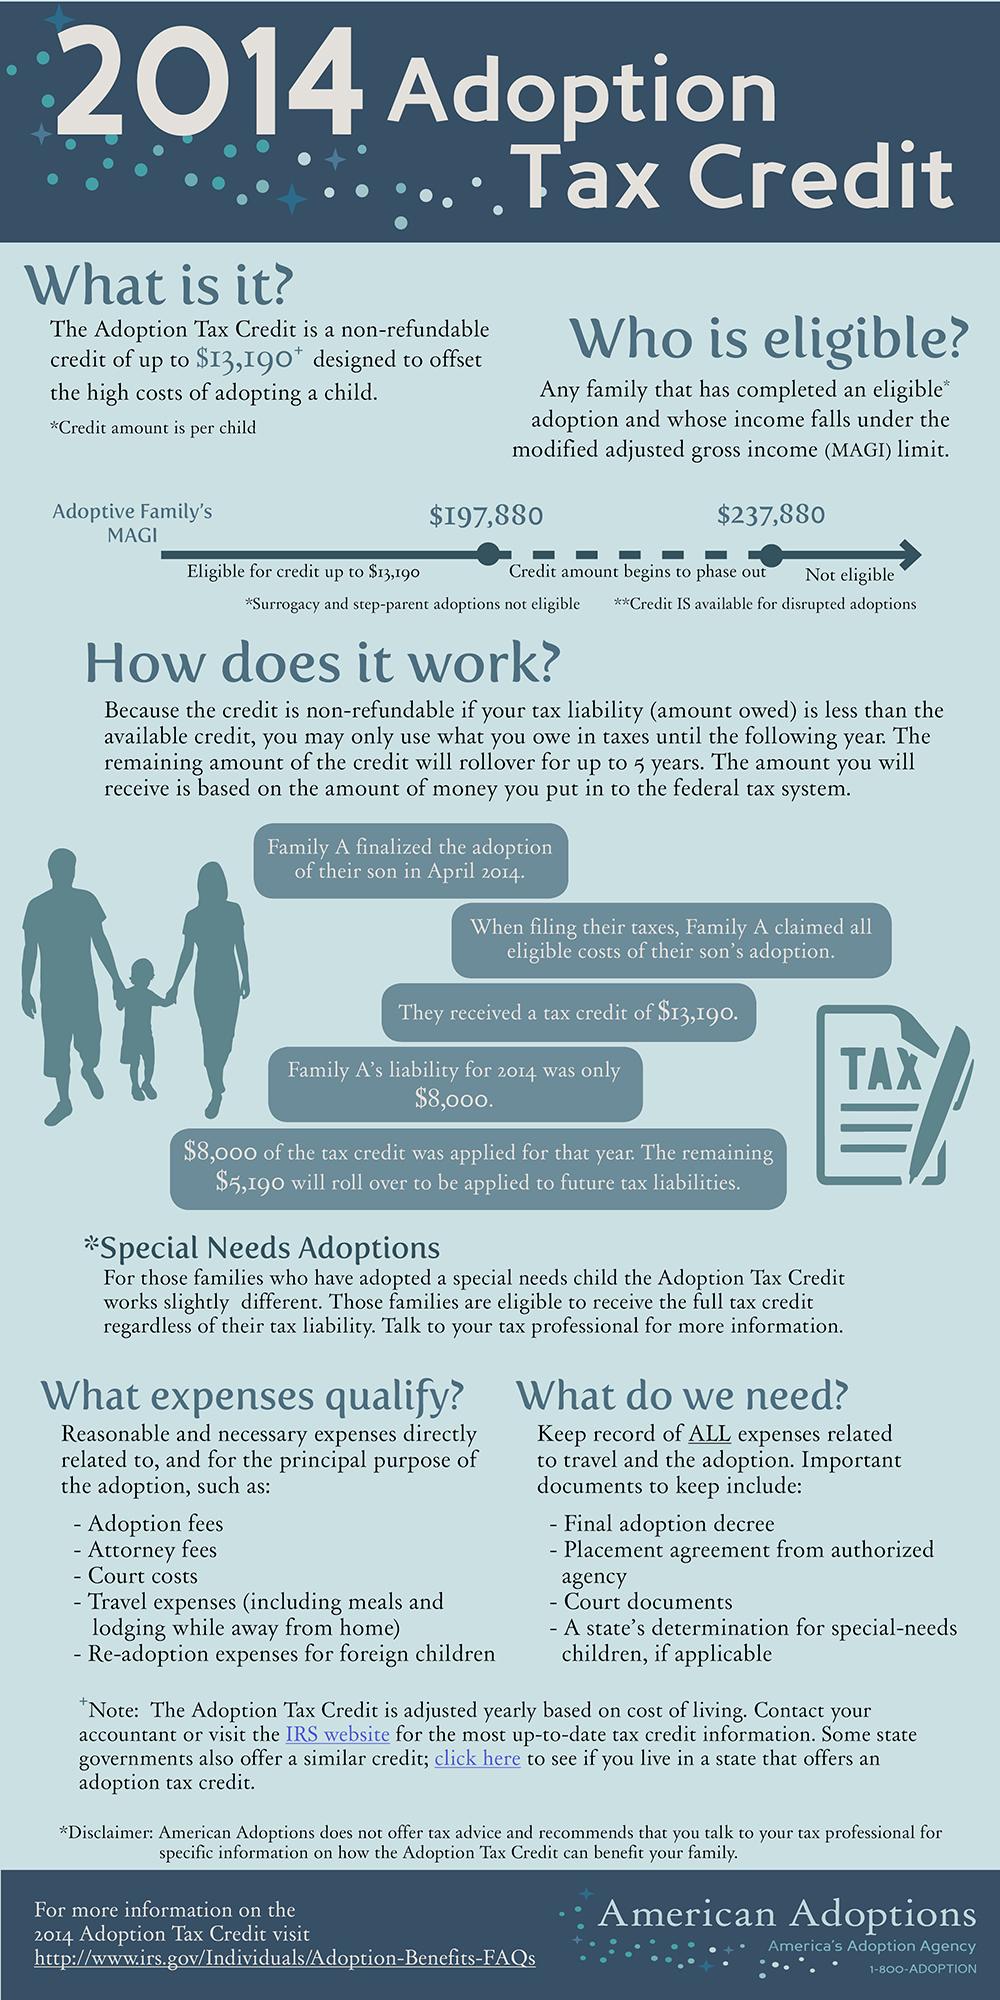 Adoption Tax Credit - smaller